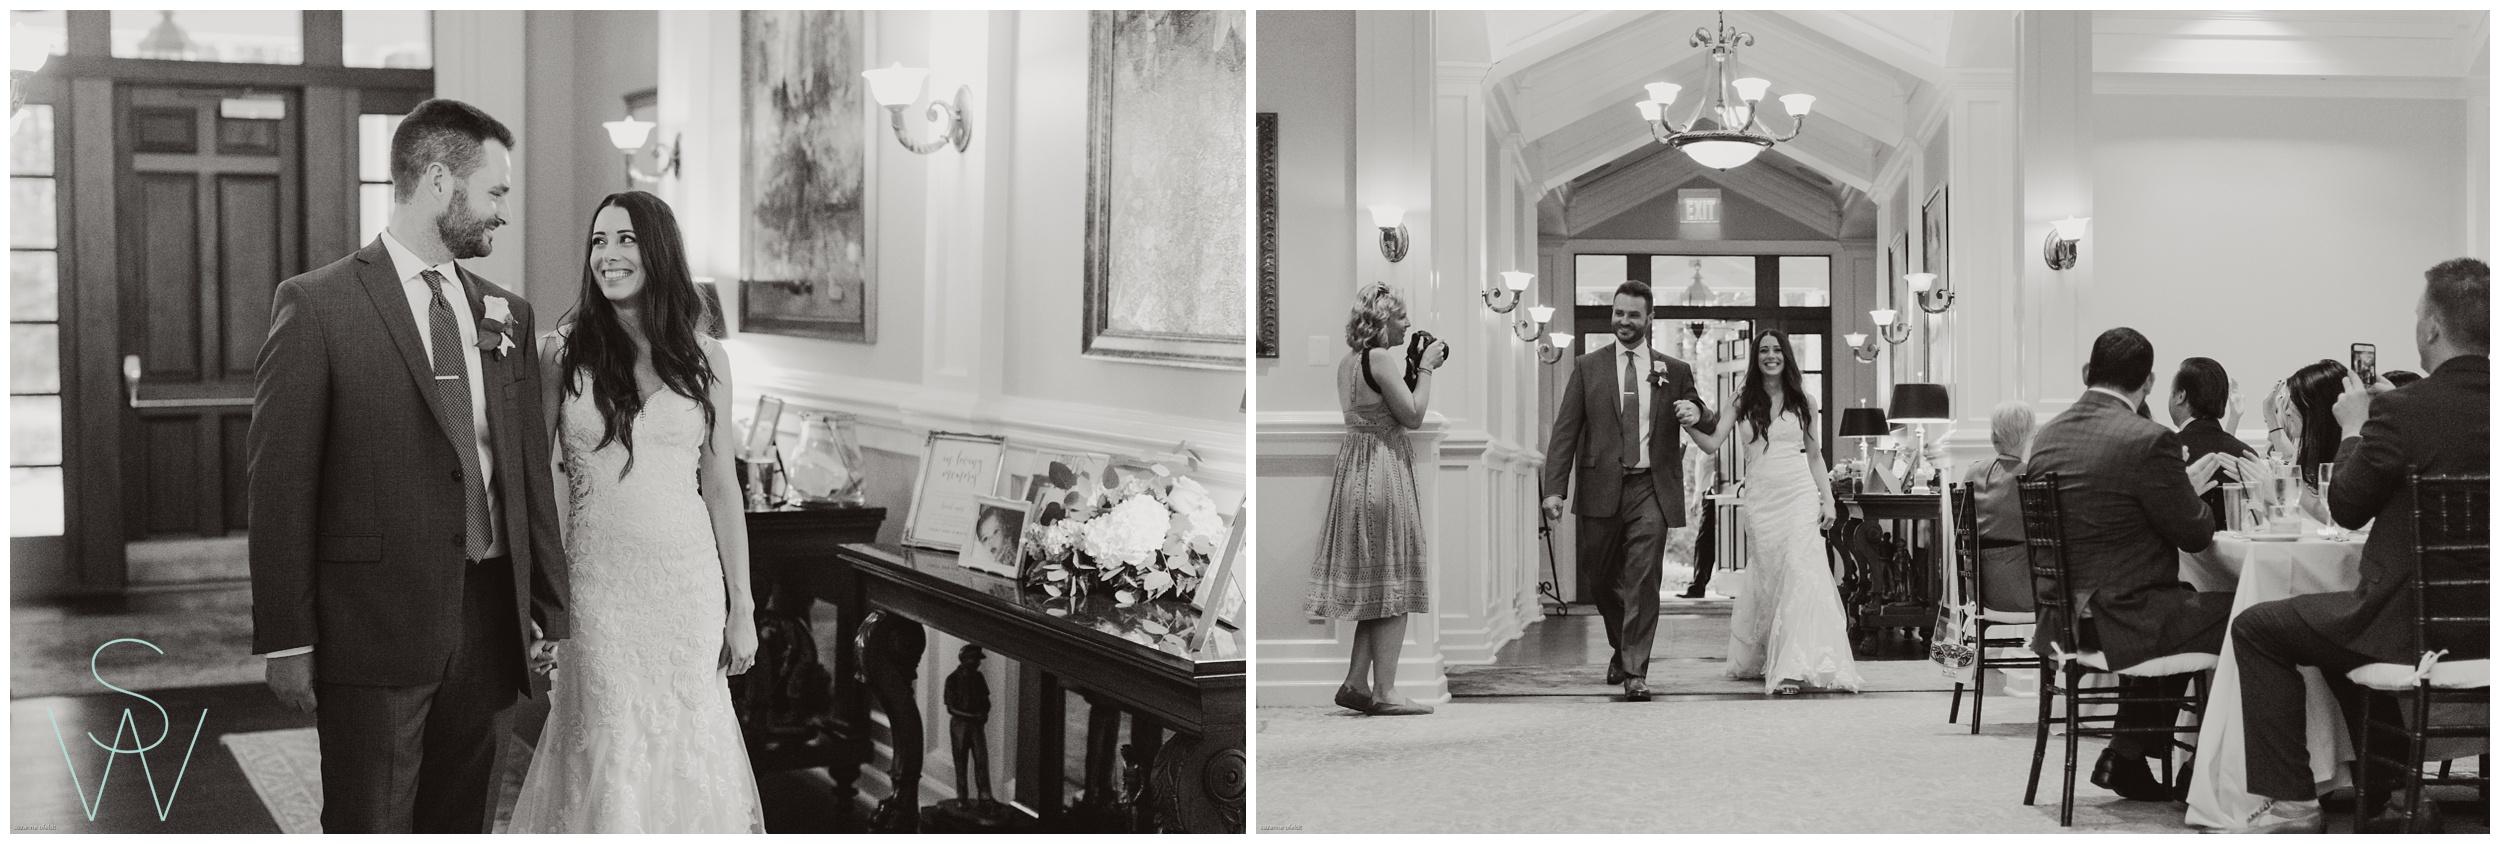 san.diego.wedding.photography_0175.jpg